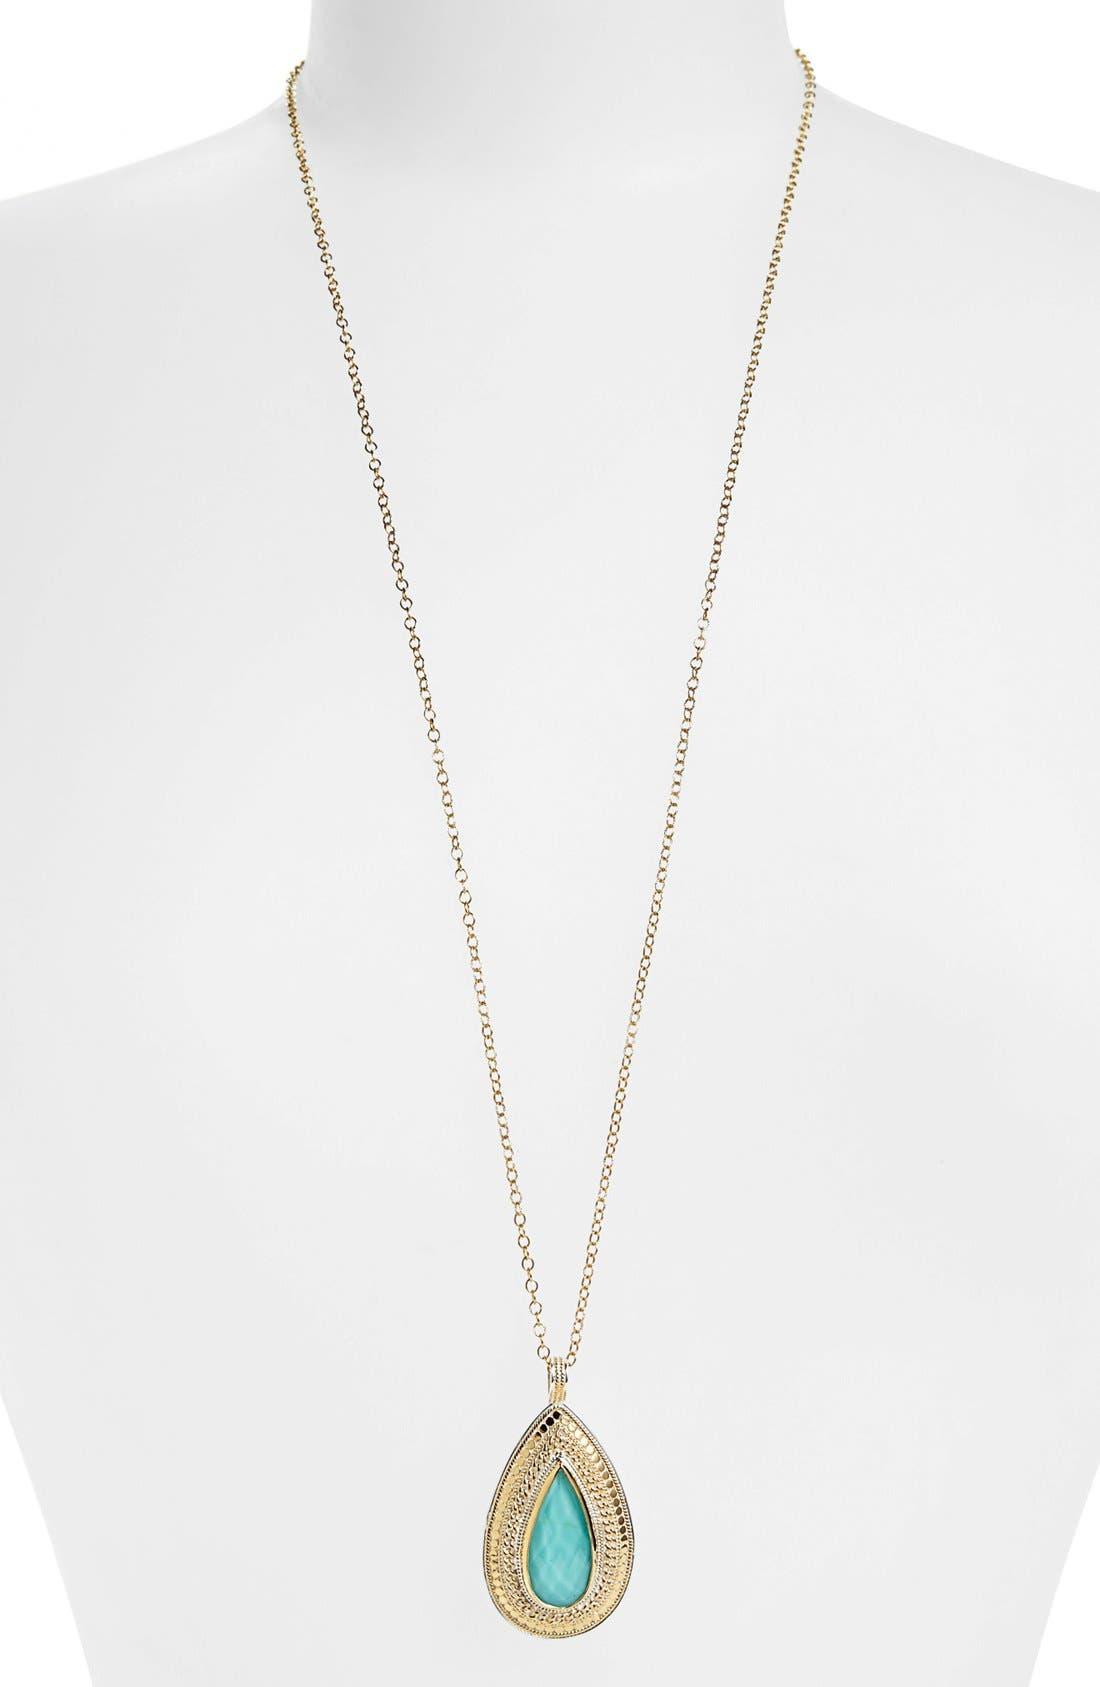 Main Image - Anna Beck 'Gili' Teardrop Pendant Necklace